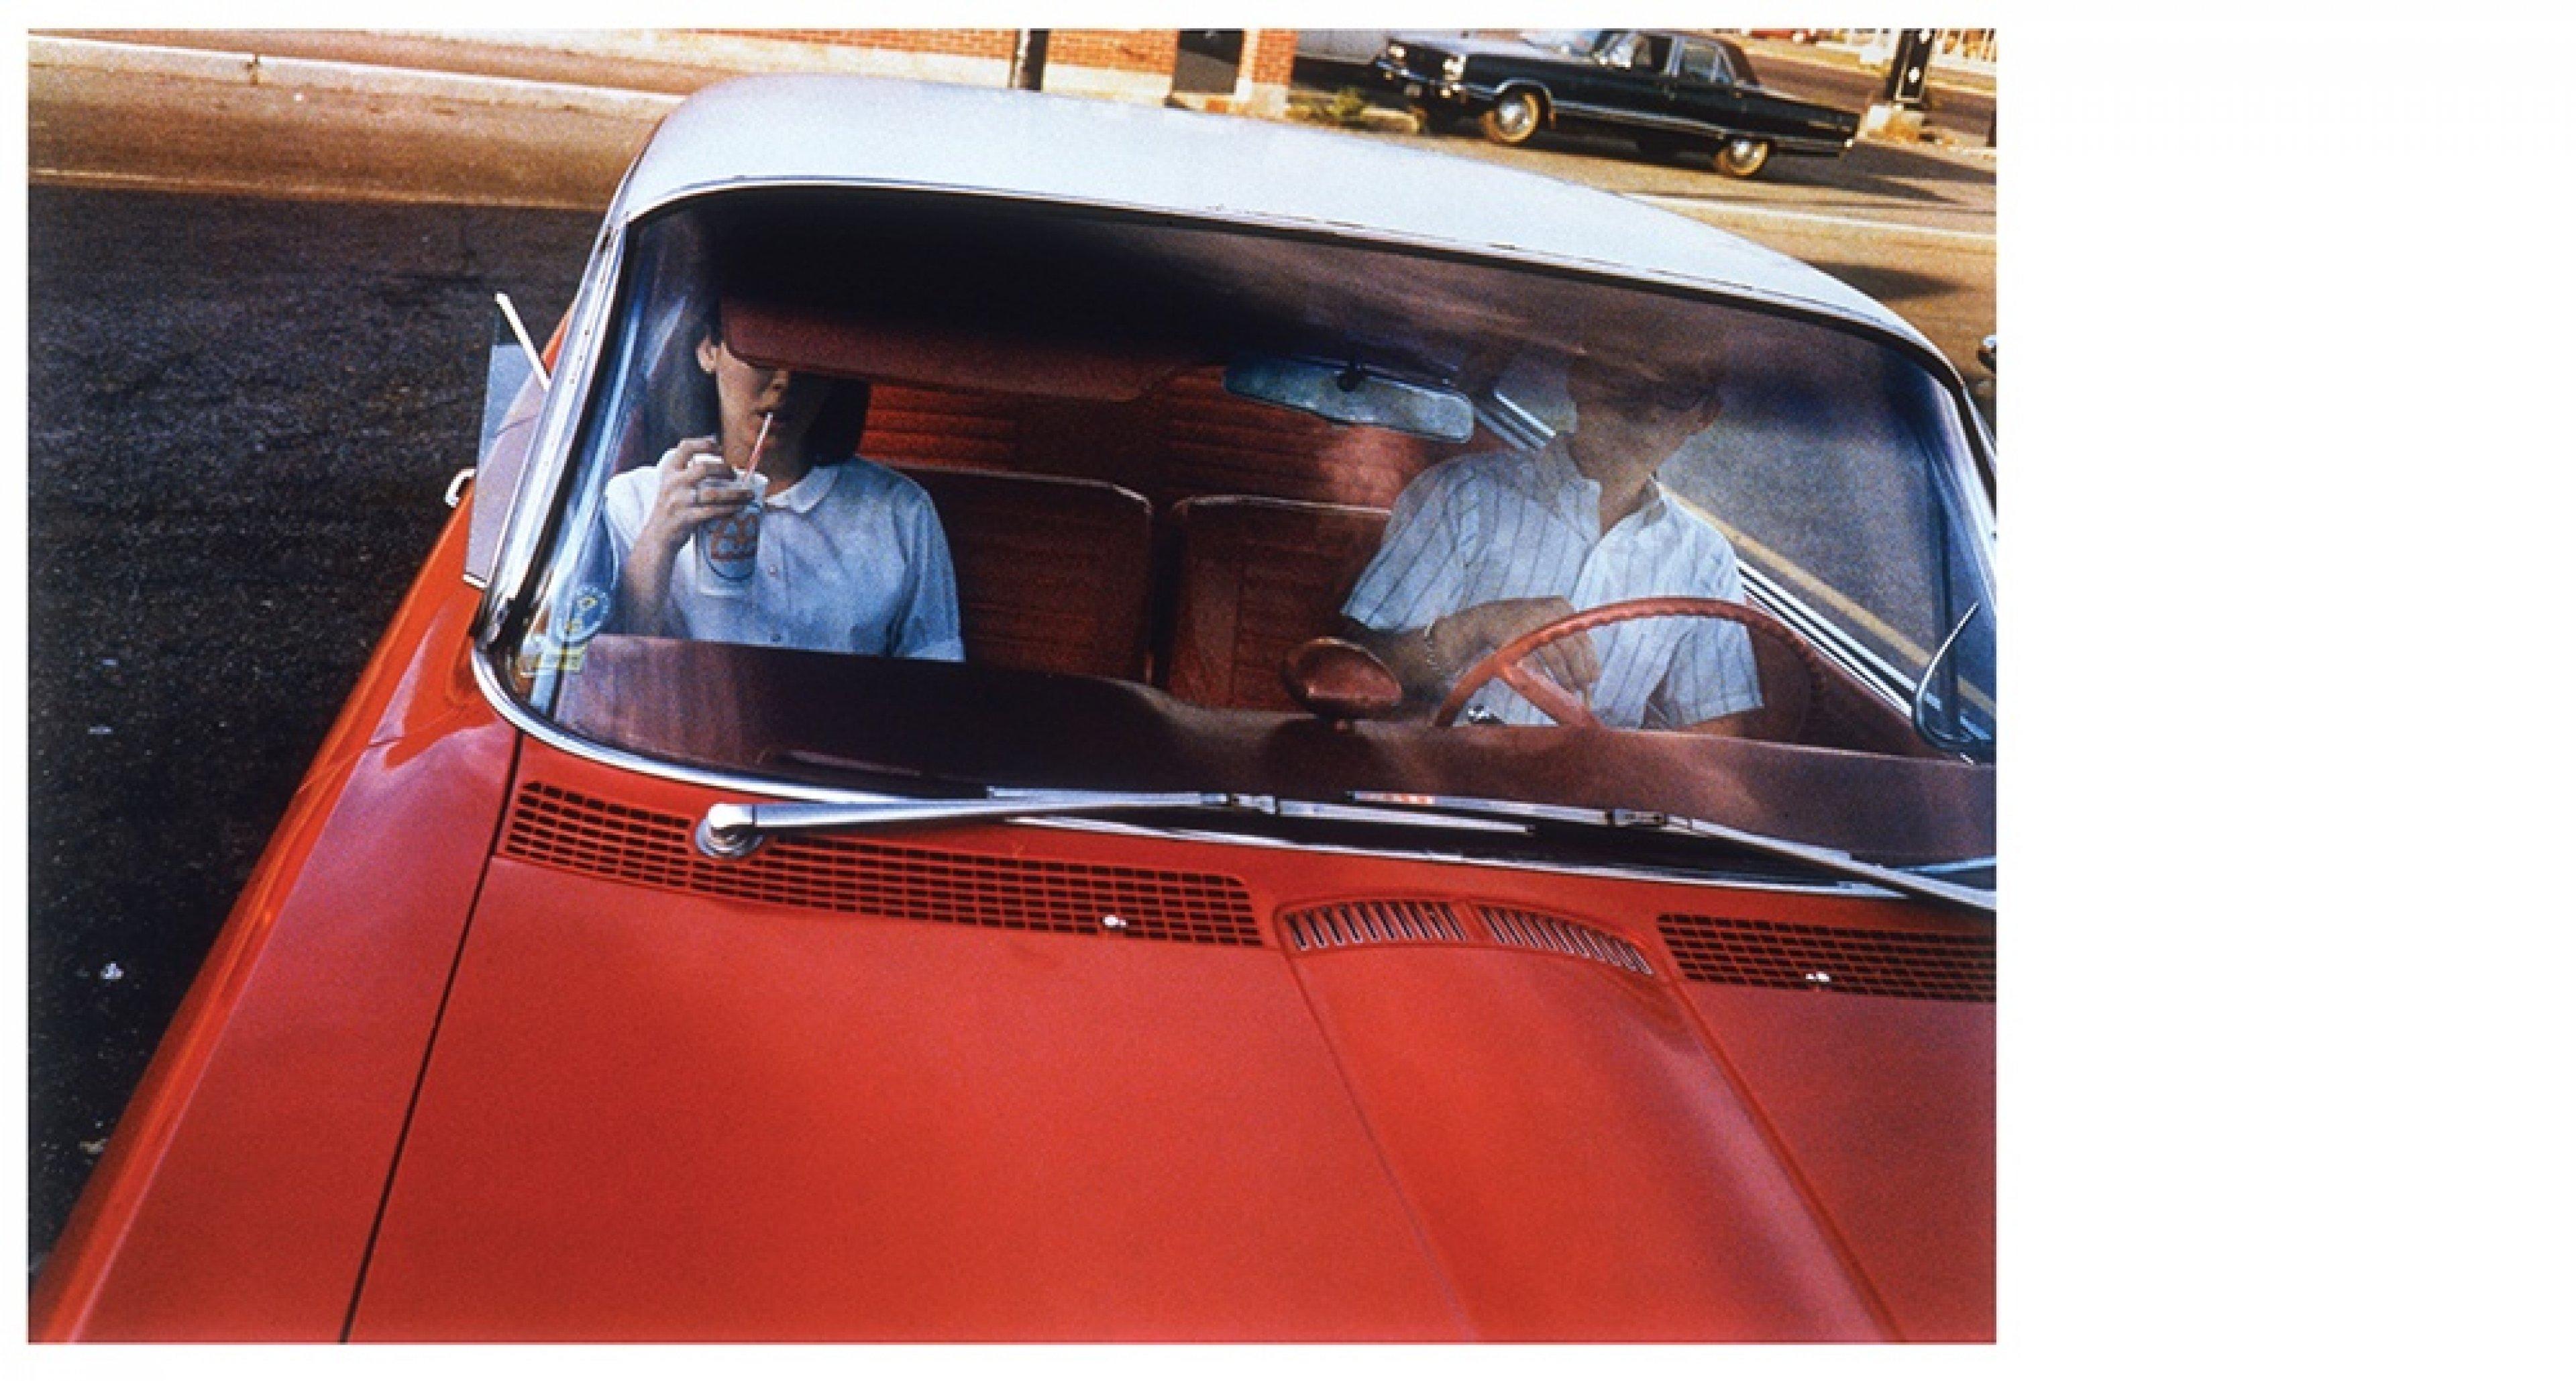 William Eggleston, Los Alamos series, 1965–1968 Dye-transfer print, 40.5 × 50.5 cm Eggleston Artistic Trust, courtesy David Zwirner, New York/London © Eggleston Artistic Trust. Courtesy David Zwirner, New York/London